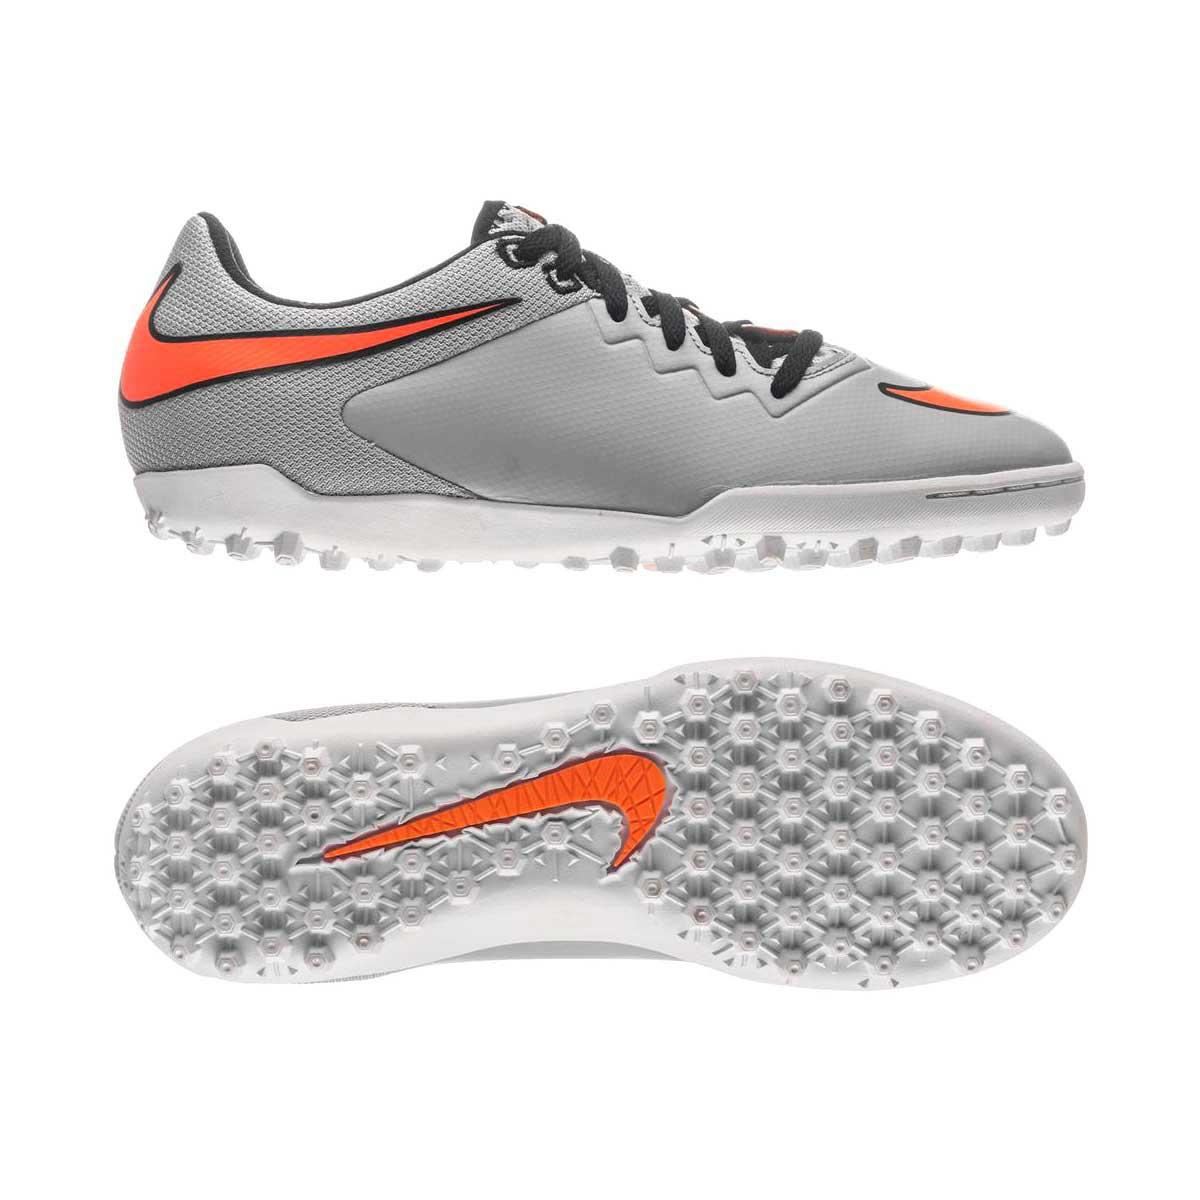 Buy Shoes Pro Online Tf Football Nike Hypervenomx India soccer ZprwZqH